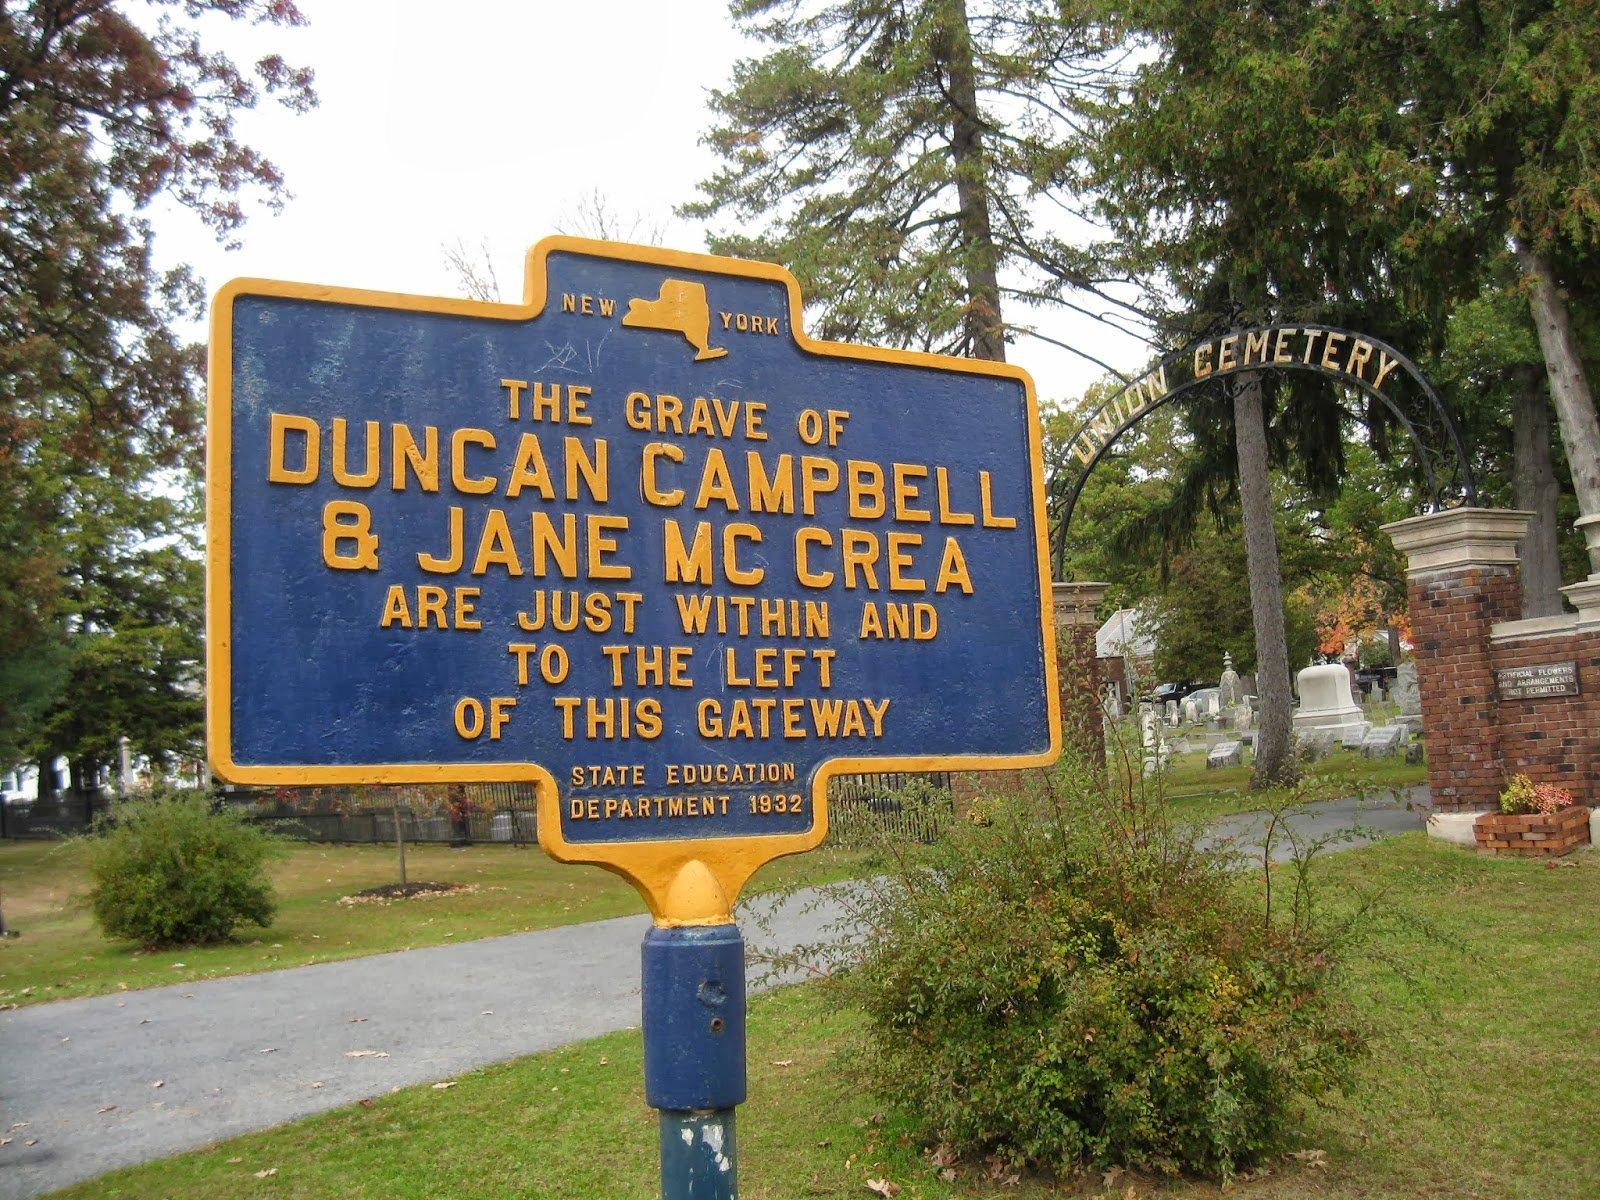 DuncanCampbellHistoricMarker